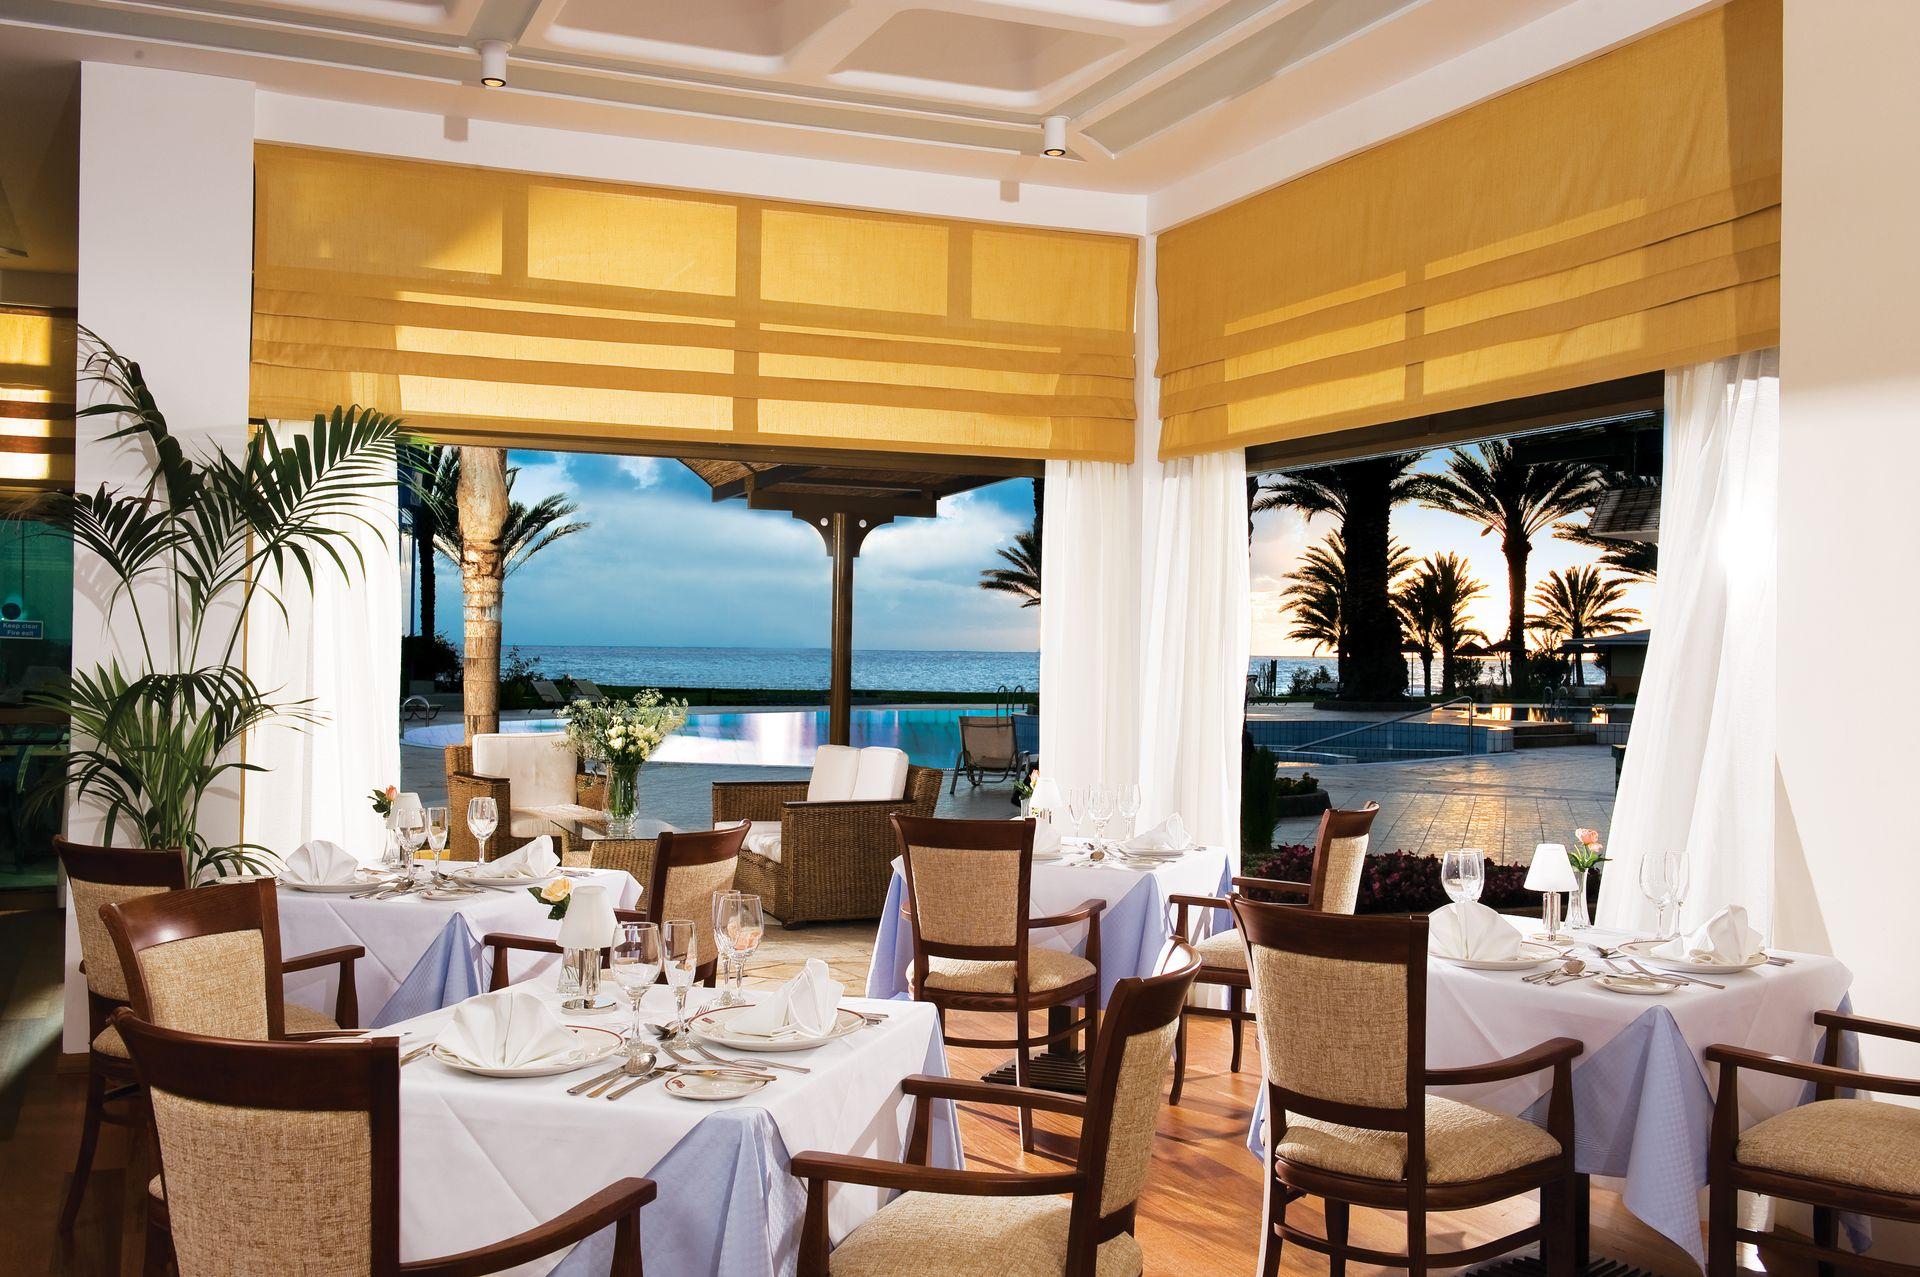 _athena beach hotel - zephyr a la carte restaurant_resized